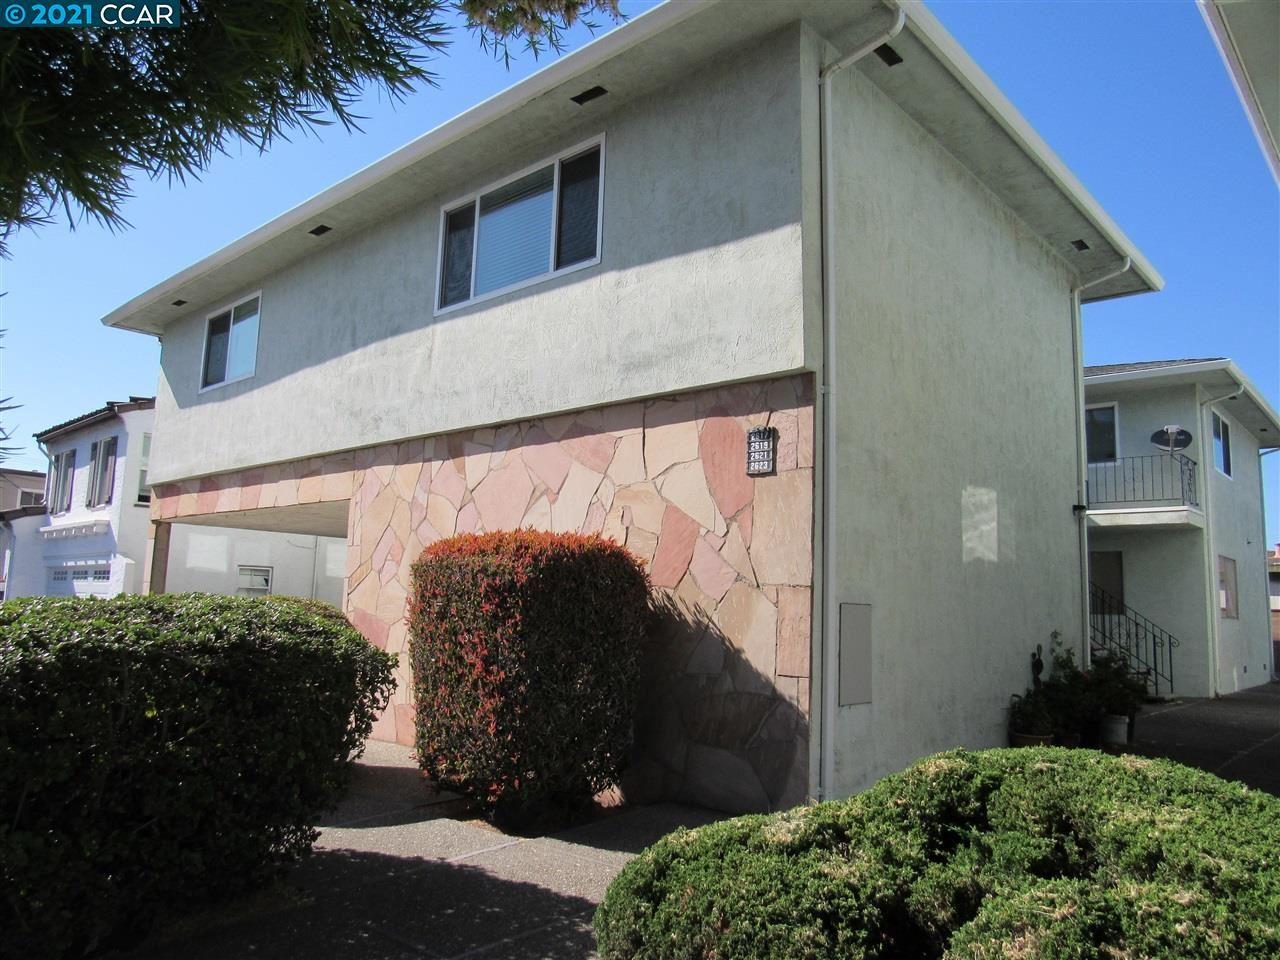 Photo of 501 27Th St, RICHMOND, CA 94804 (MLS # 40962589)